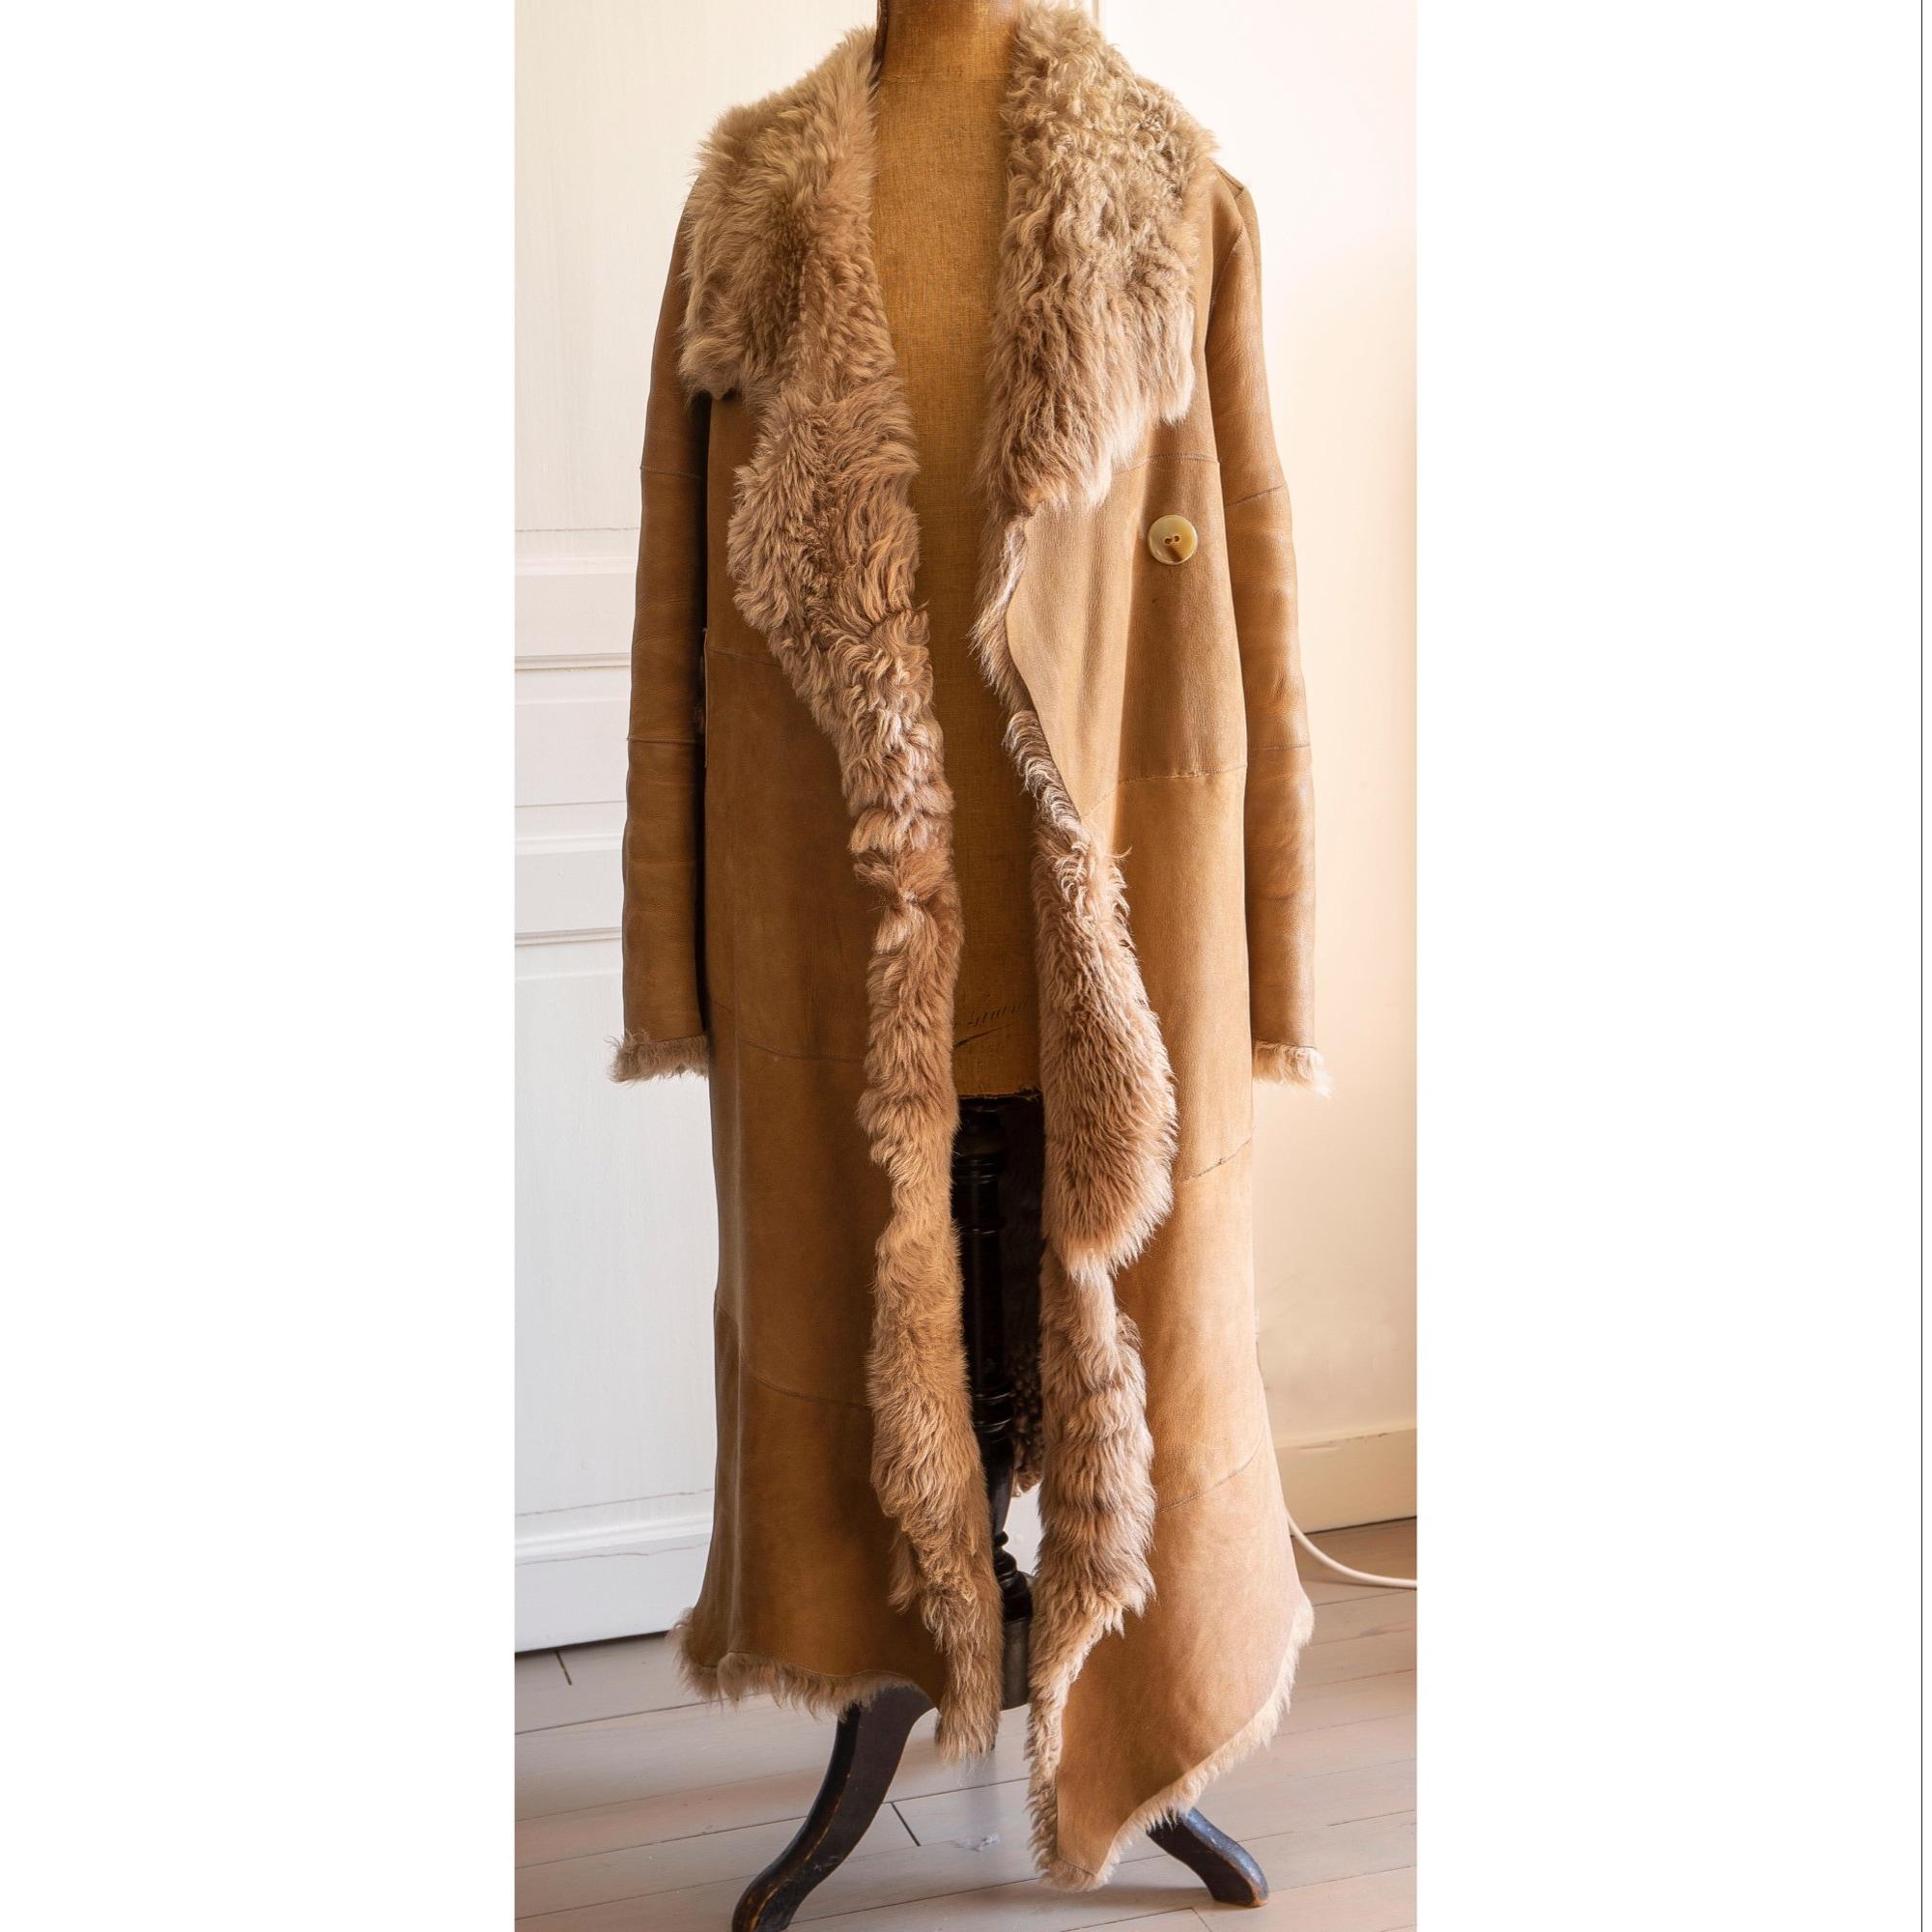 Manteau en fourrure PLEIN SUD Beige, camel